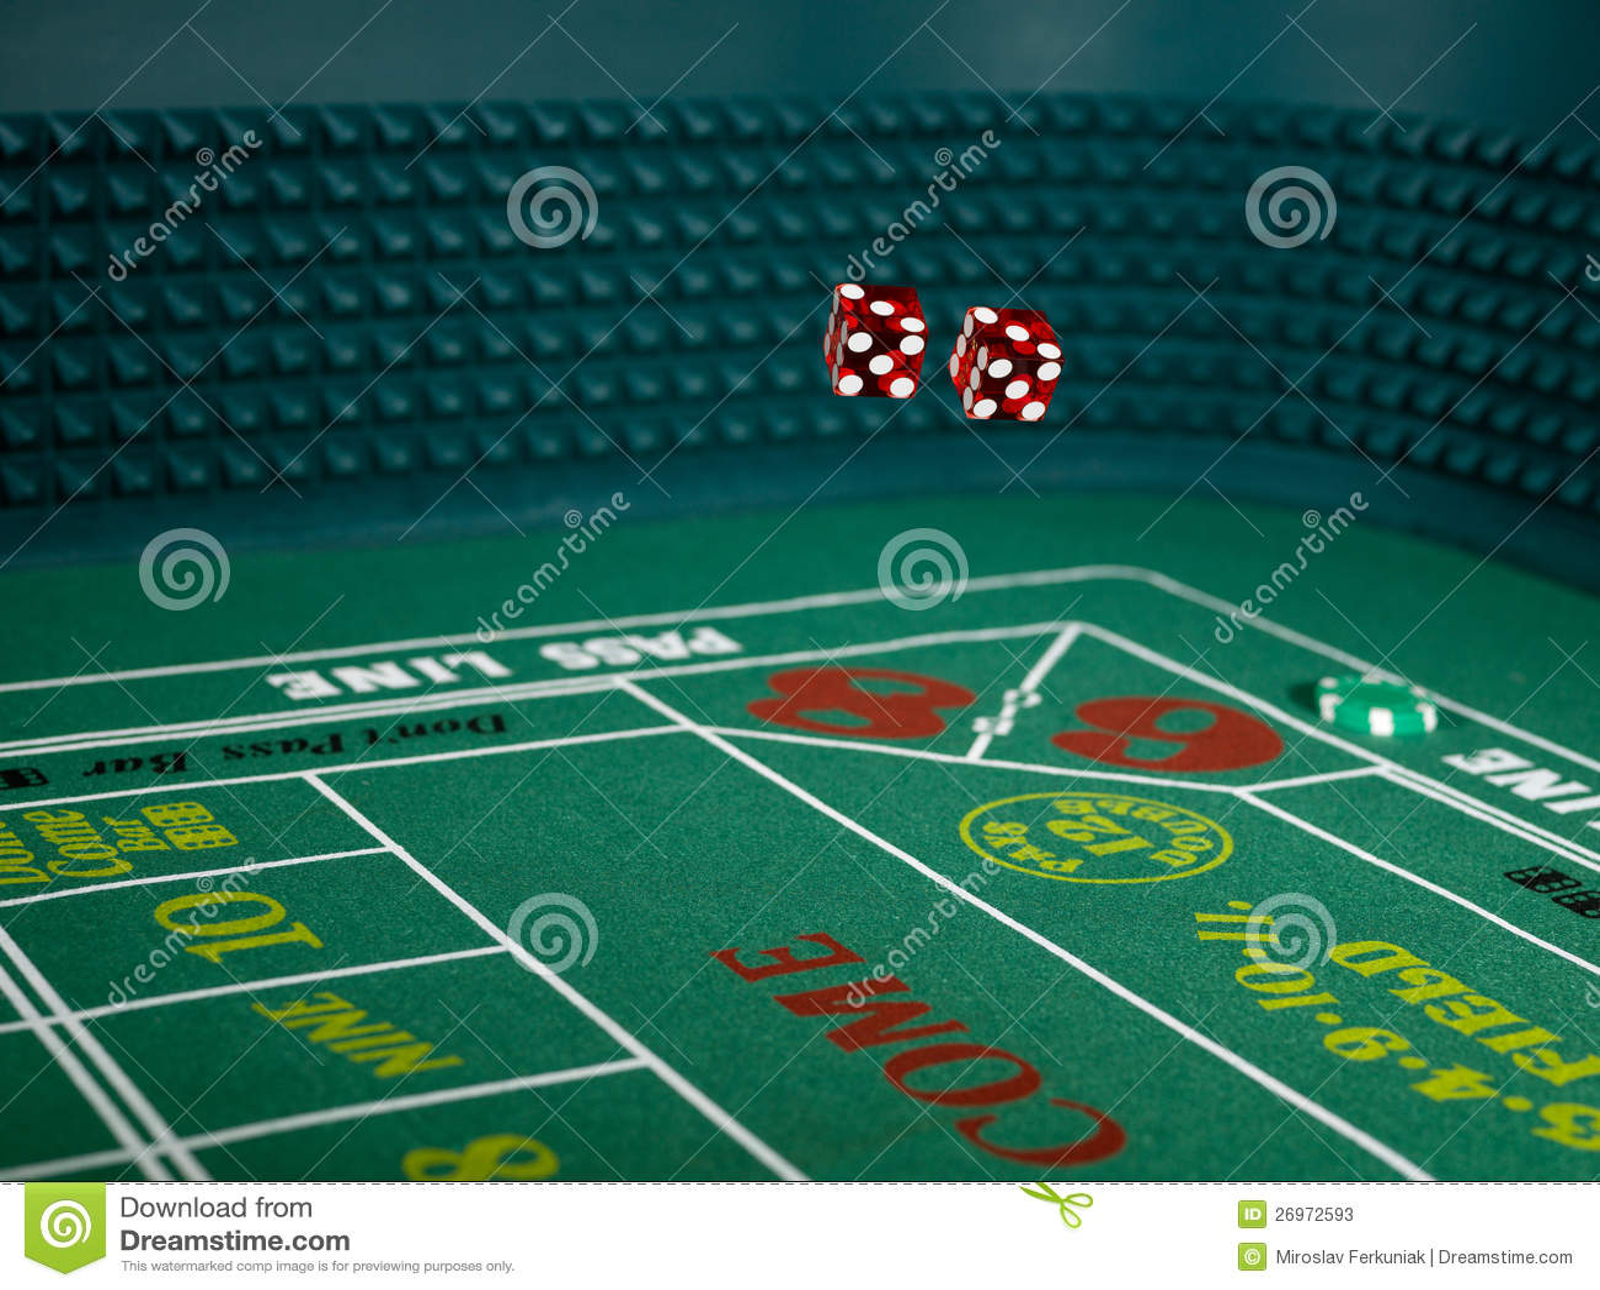 Romanian gambling conference